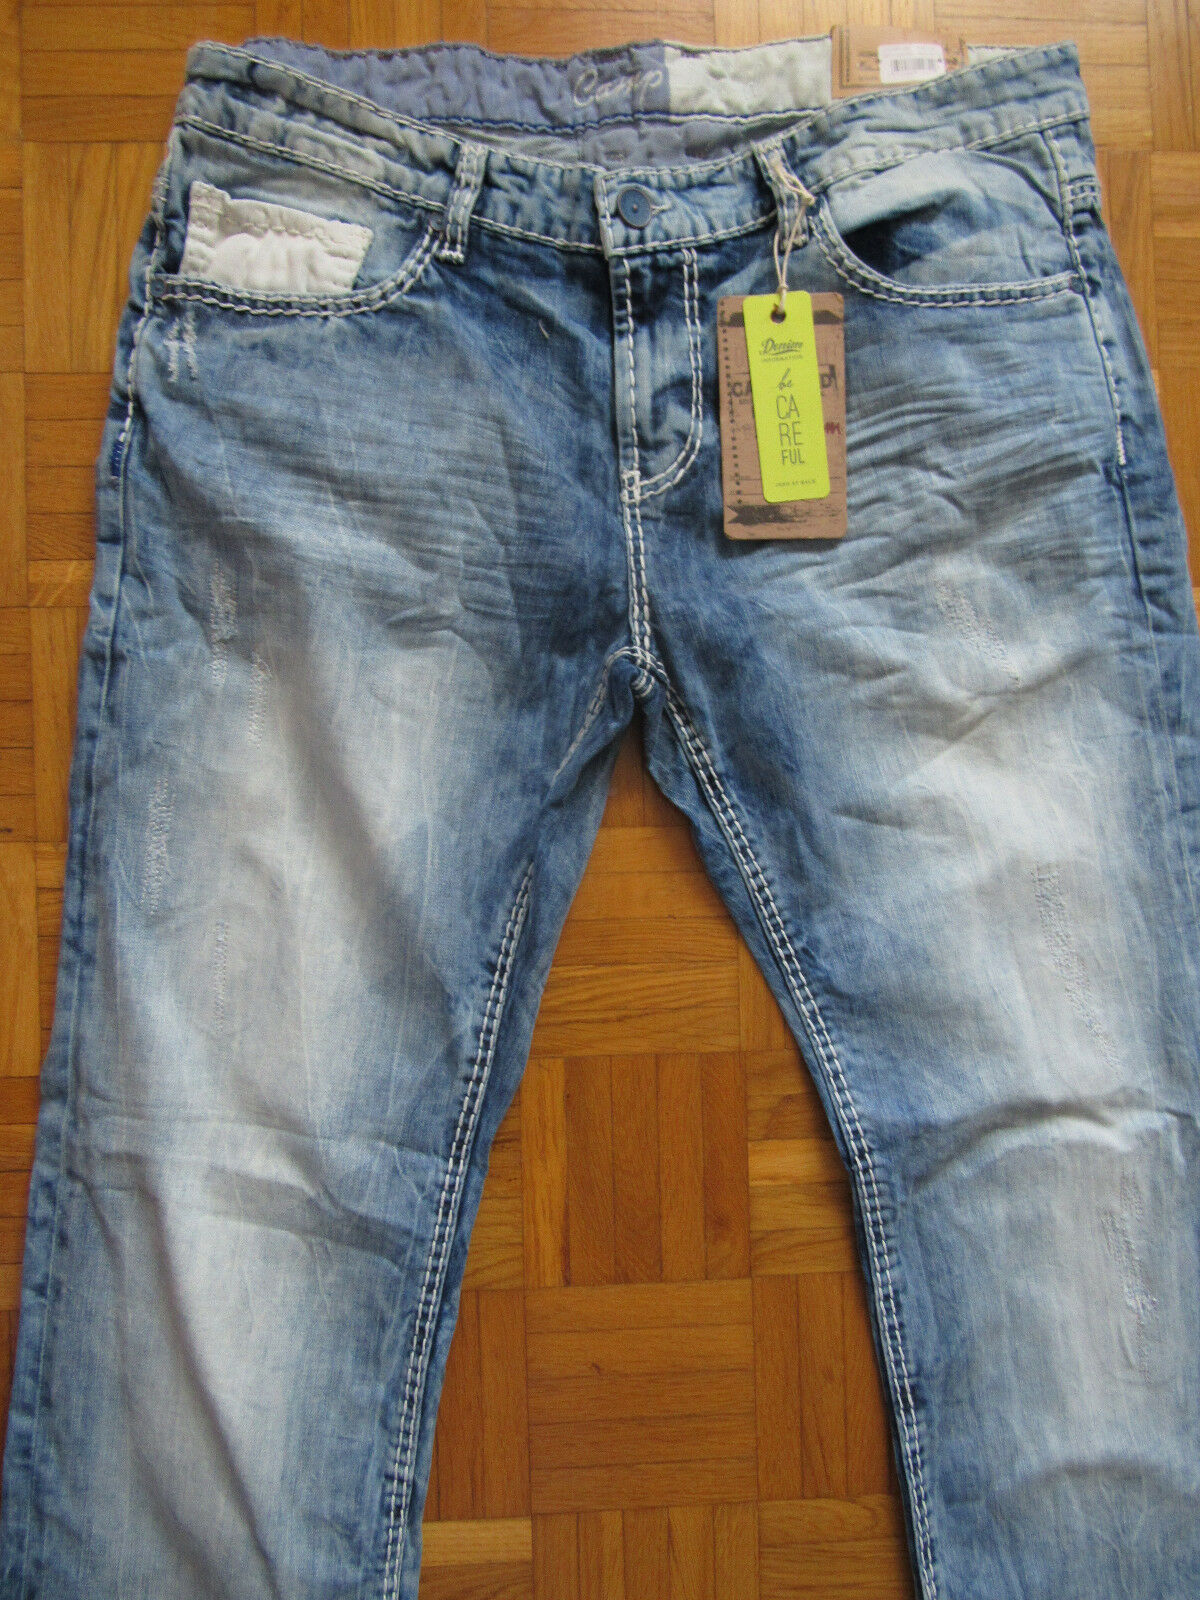 100% Camp David Herren Jeans Modell; Denim CD FS light Vintage used ;W 30 L32